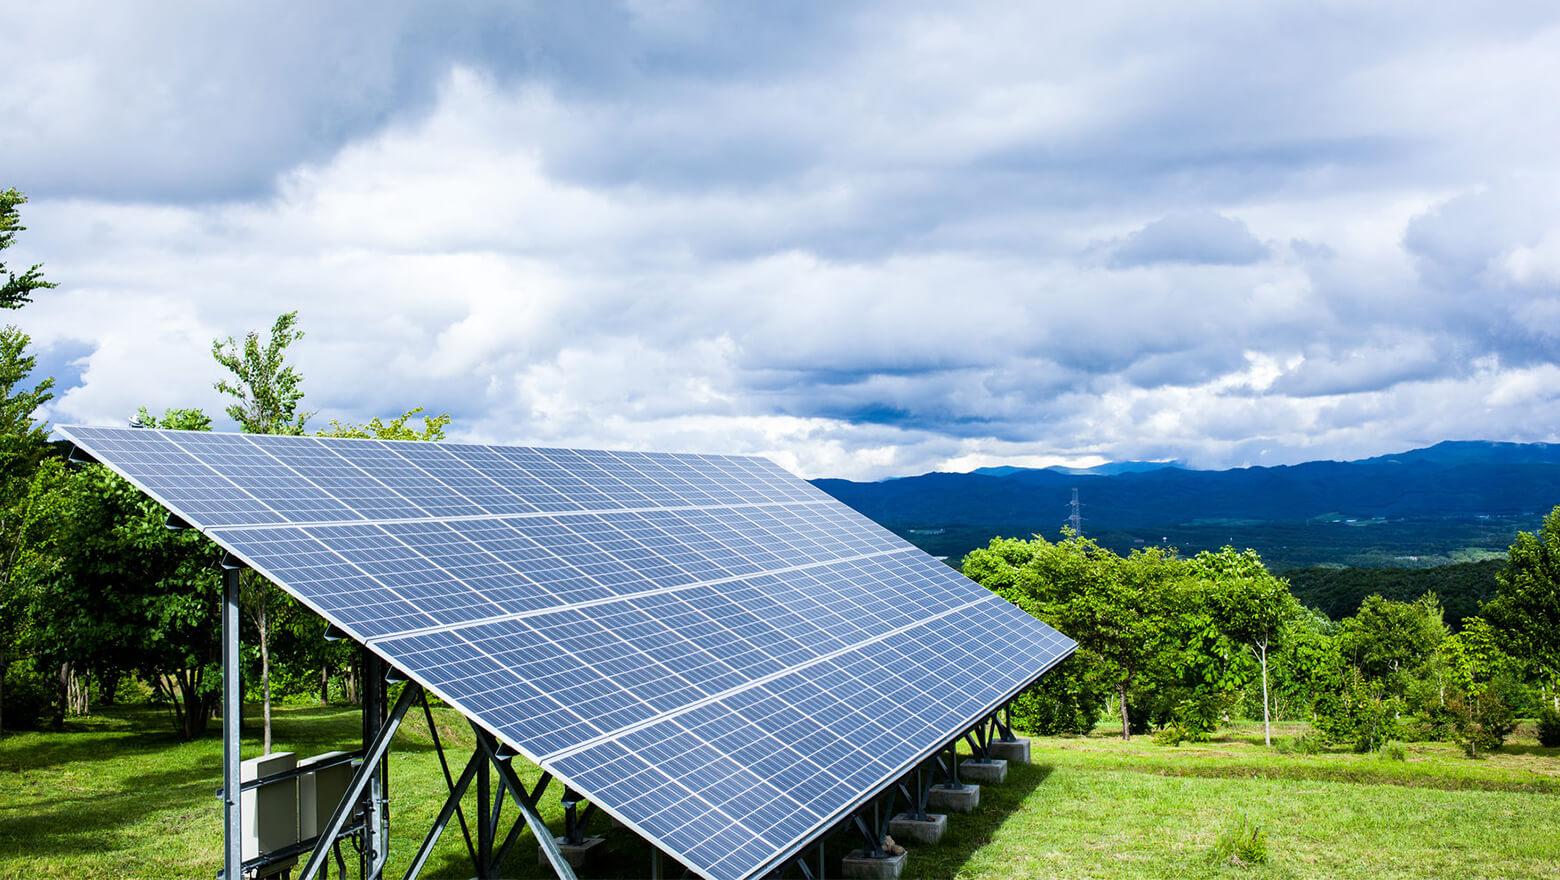 Four Ways to Finance Solar Panels - SoFi